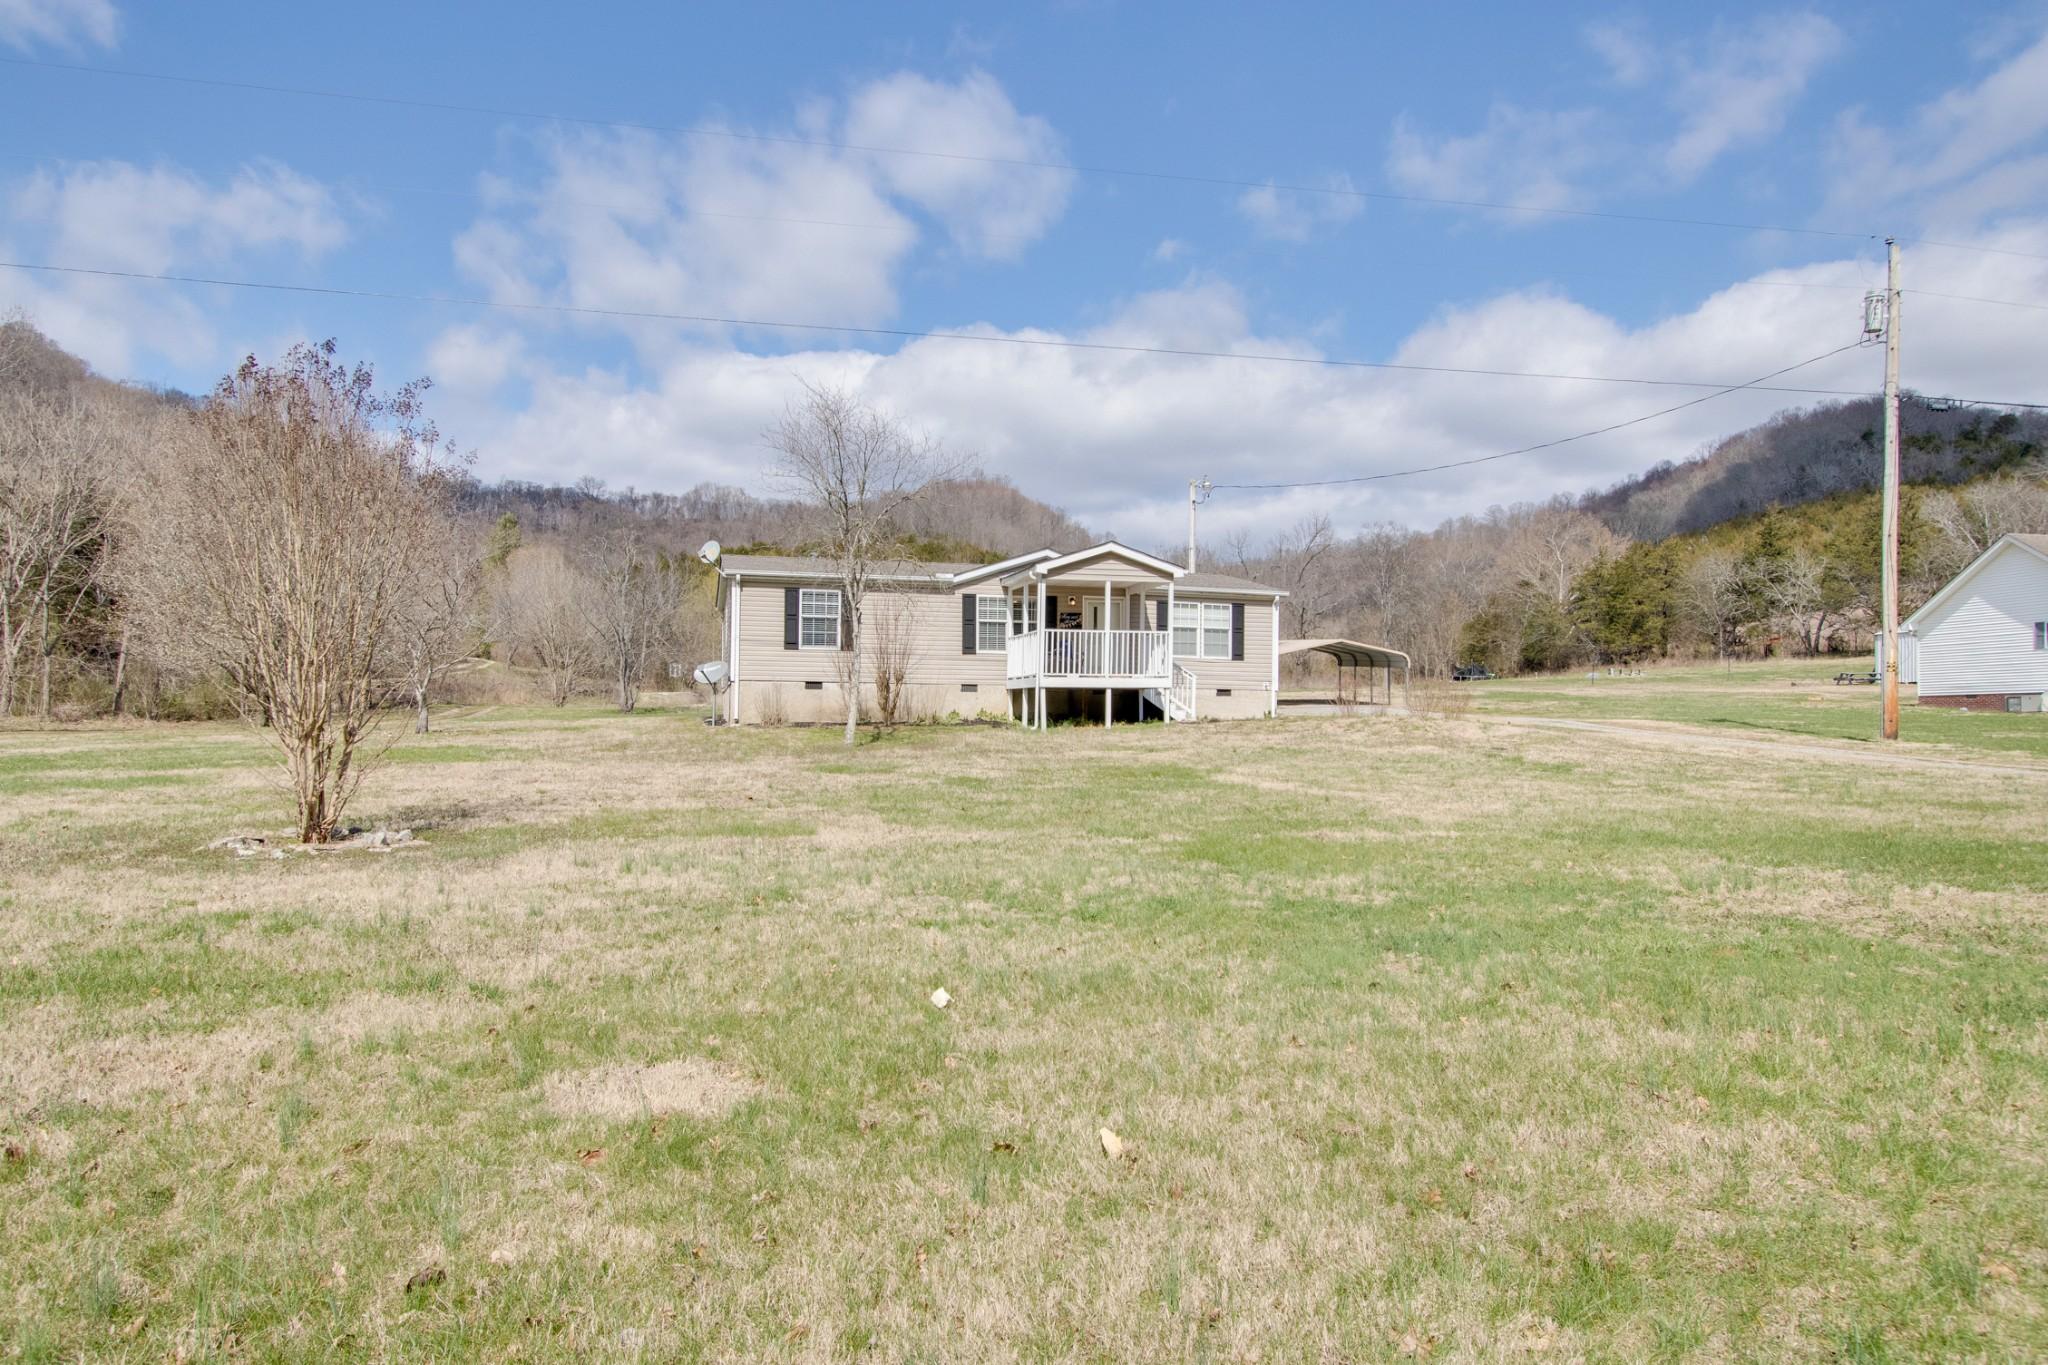 101 Hackett Hollow Ln, Pleasant Shade, TN 37145 - Pleasant Shade, TN real estate listing